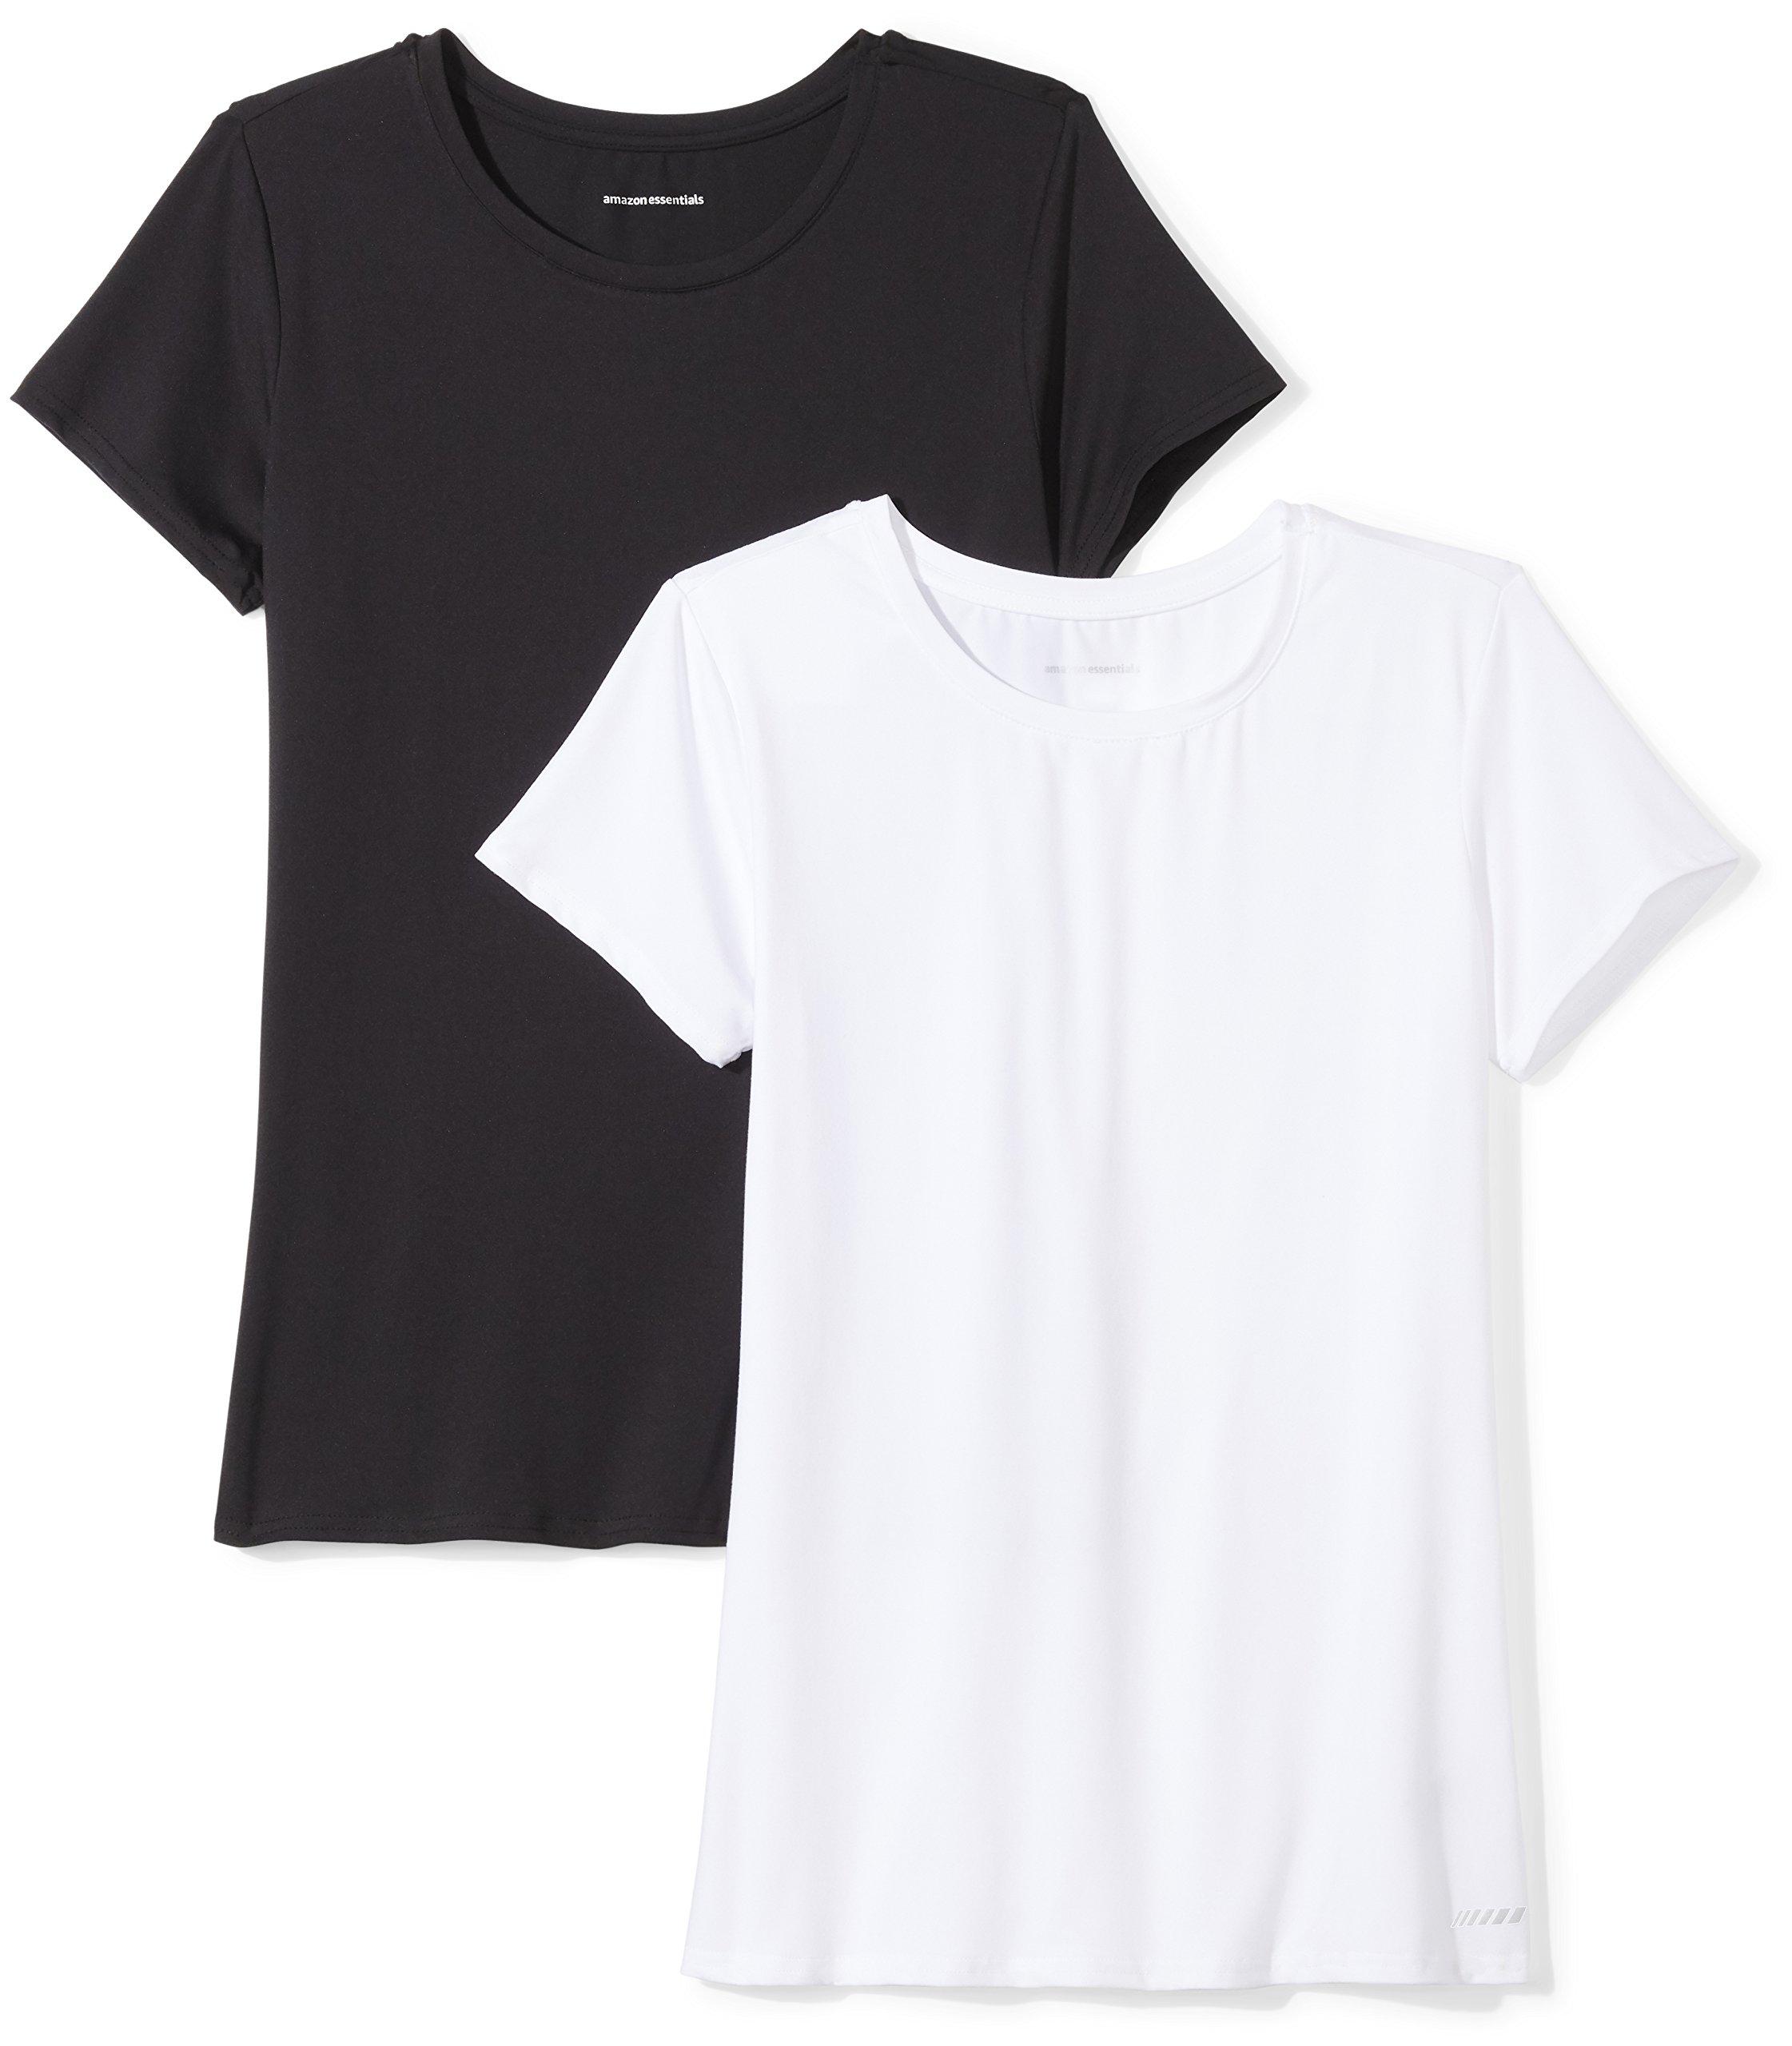 Amazon Essentials Women's 2-Pack Tech Stretch Short-Sleeve Crewneck T-Shirt Shirt, Black/White, Large